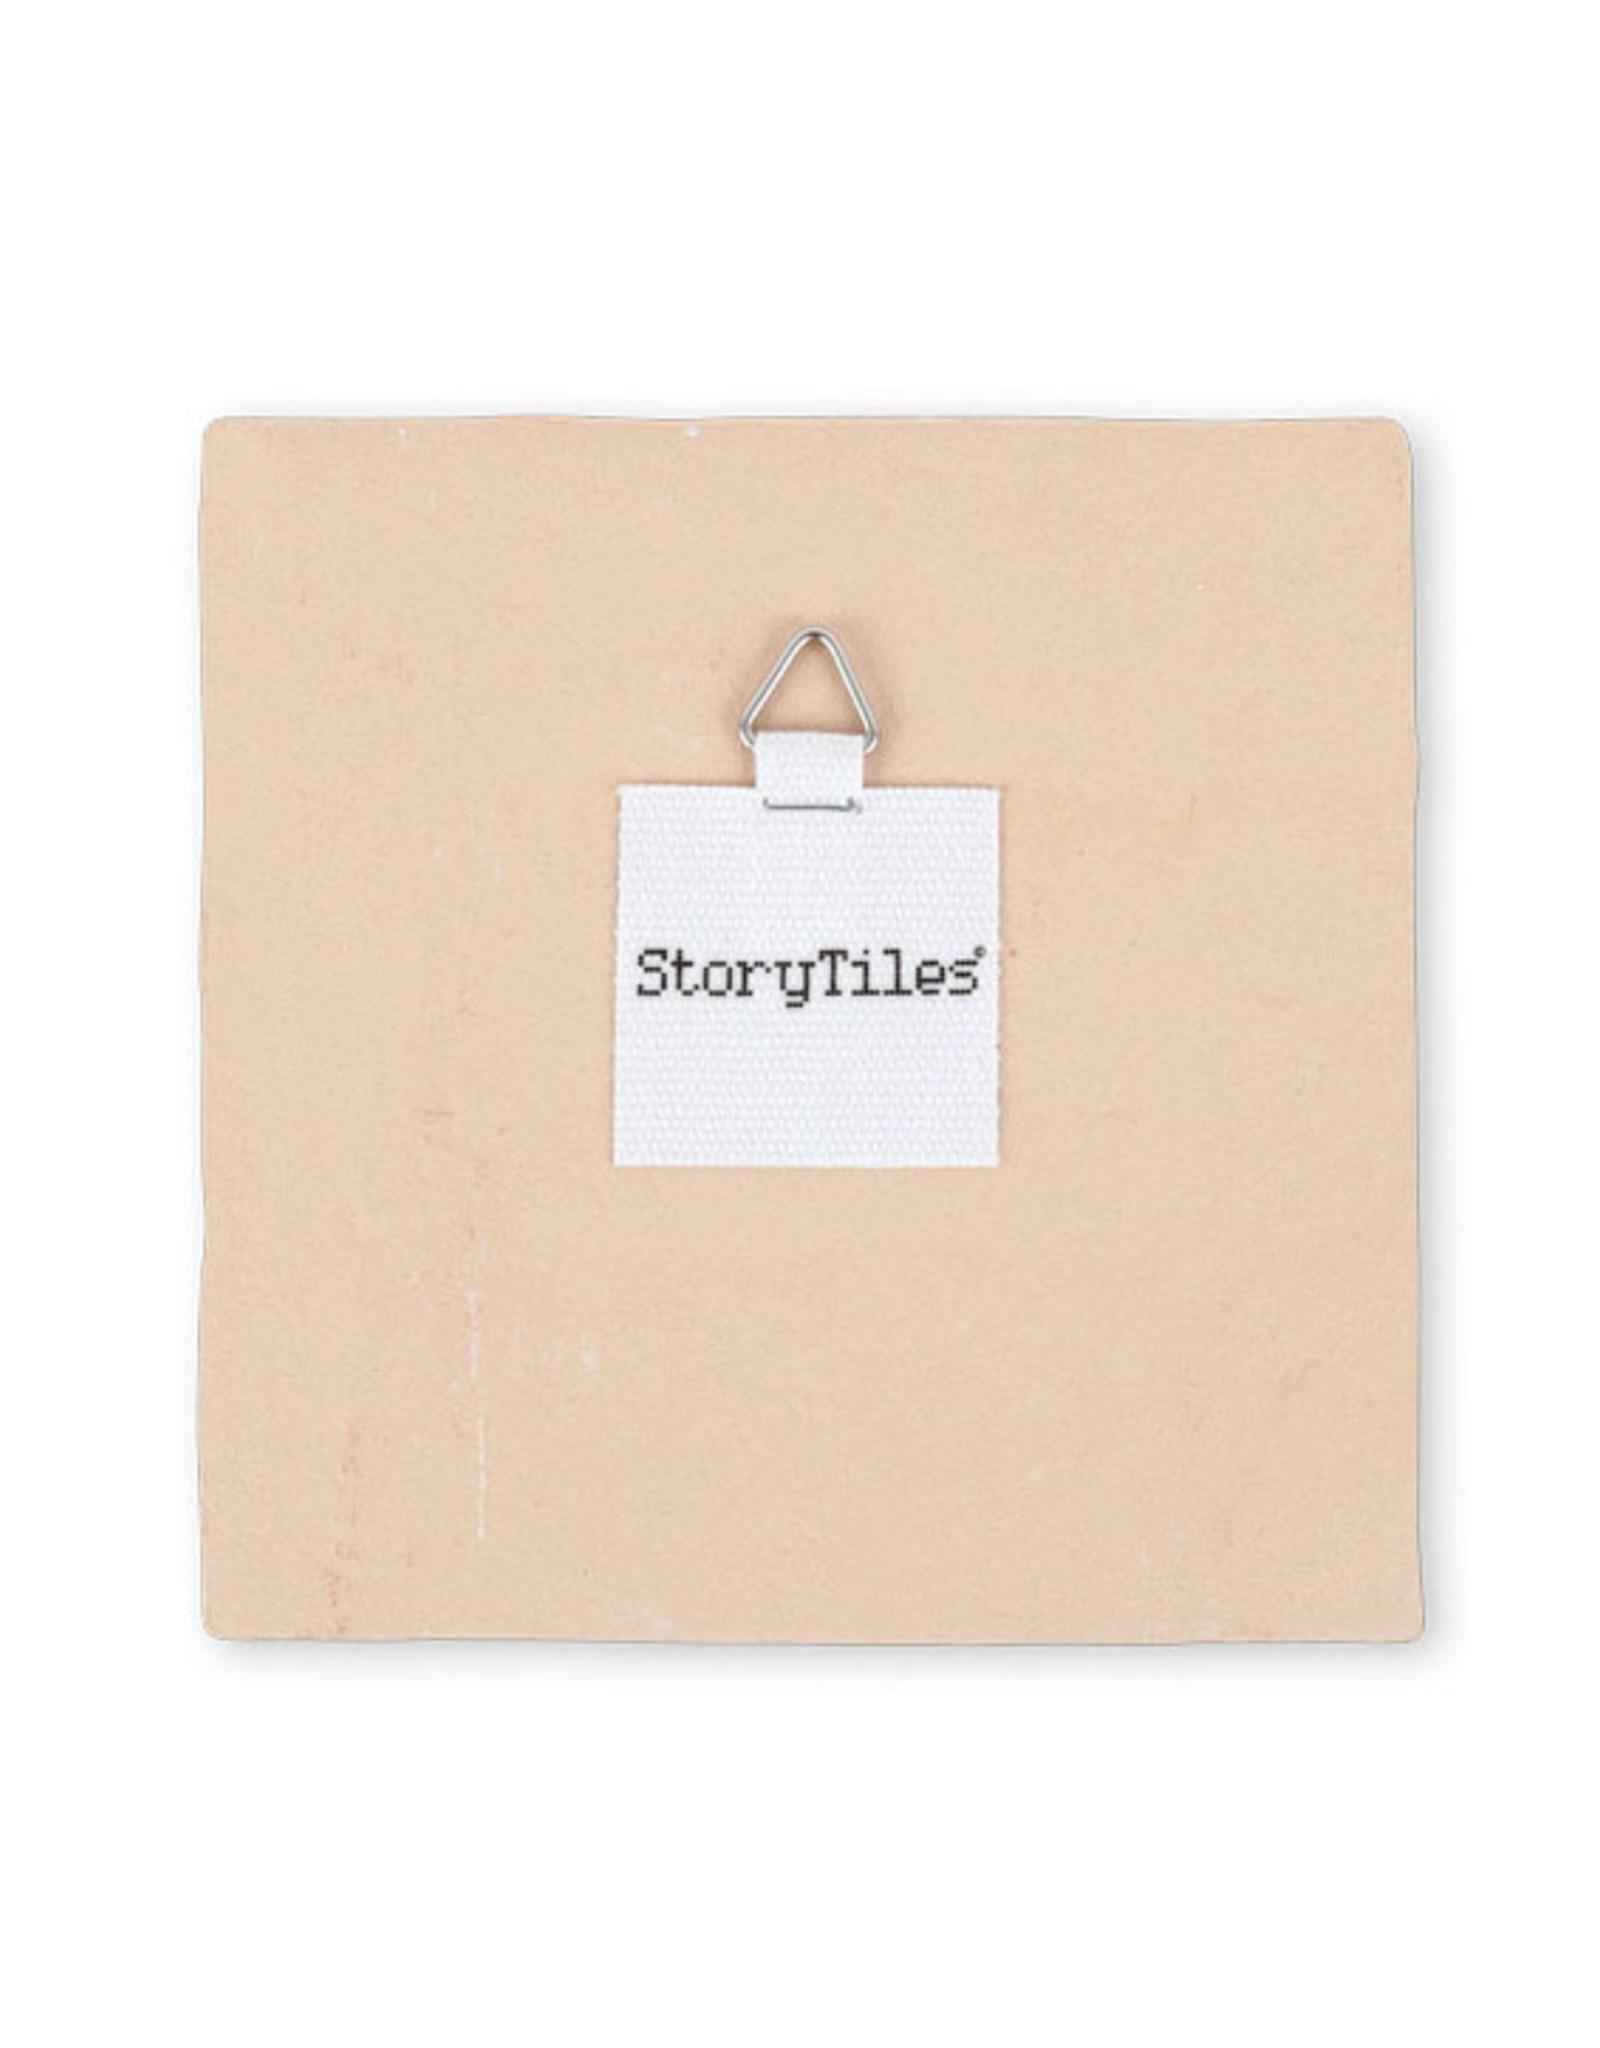 "StoryTiles ""jumping fox"" Tile"